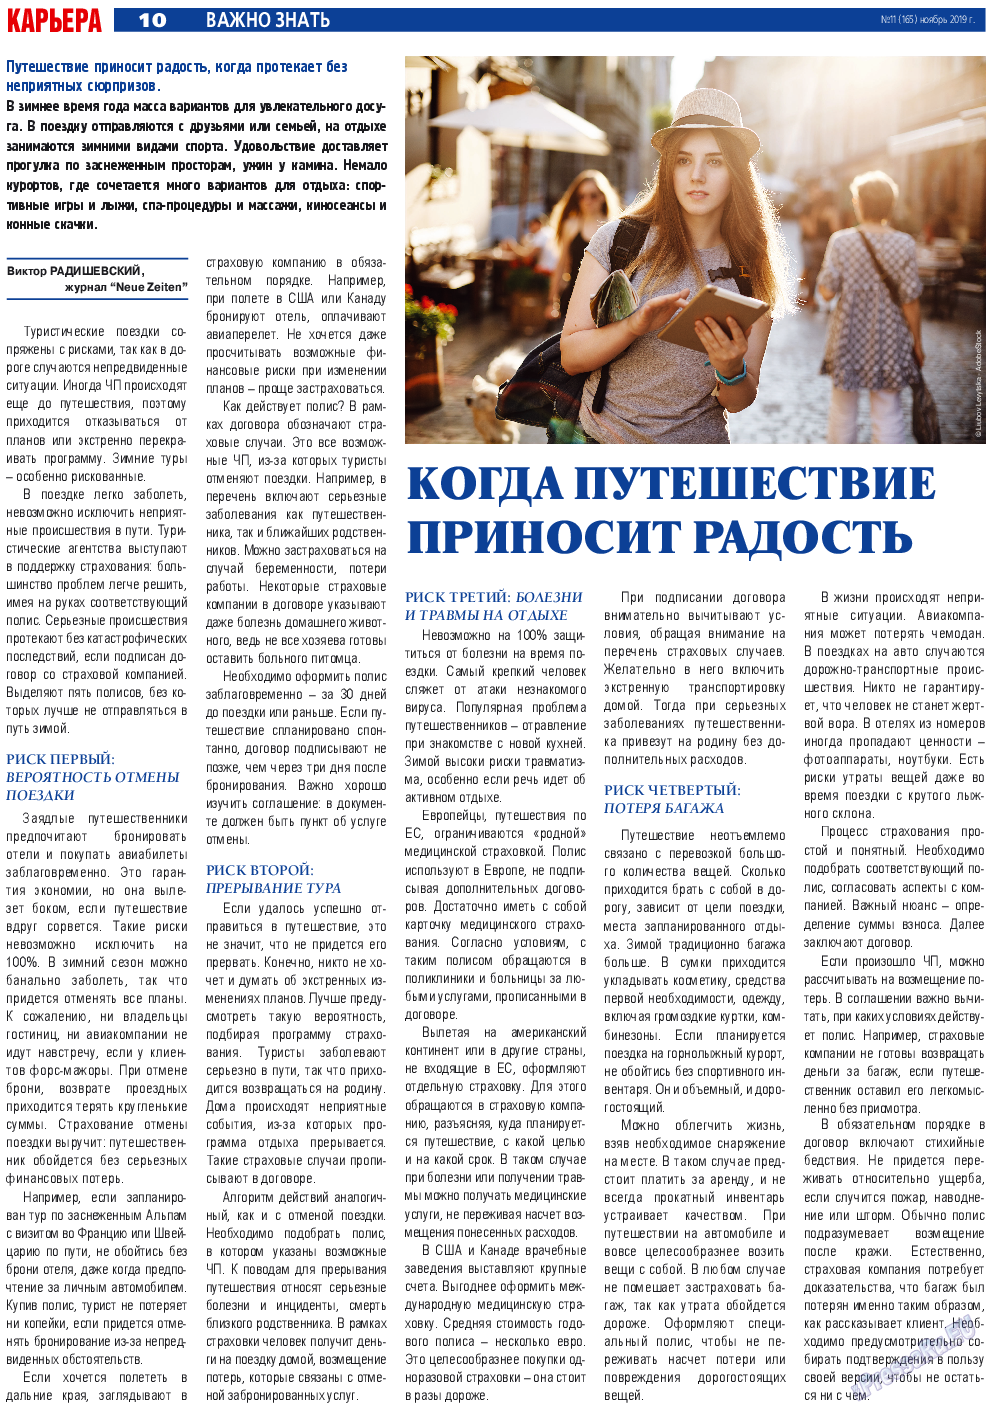 Карьера (газета). 2019 год, номер 11, стр. 10